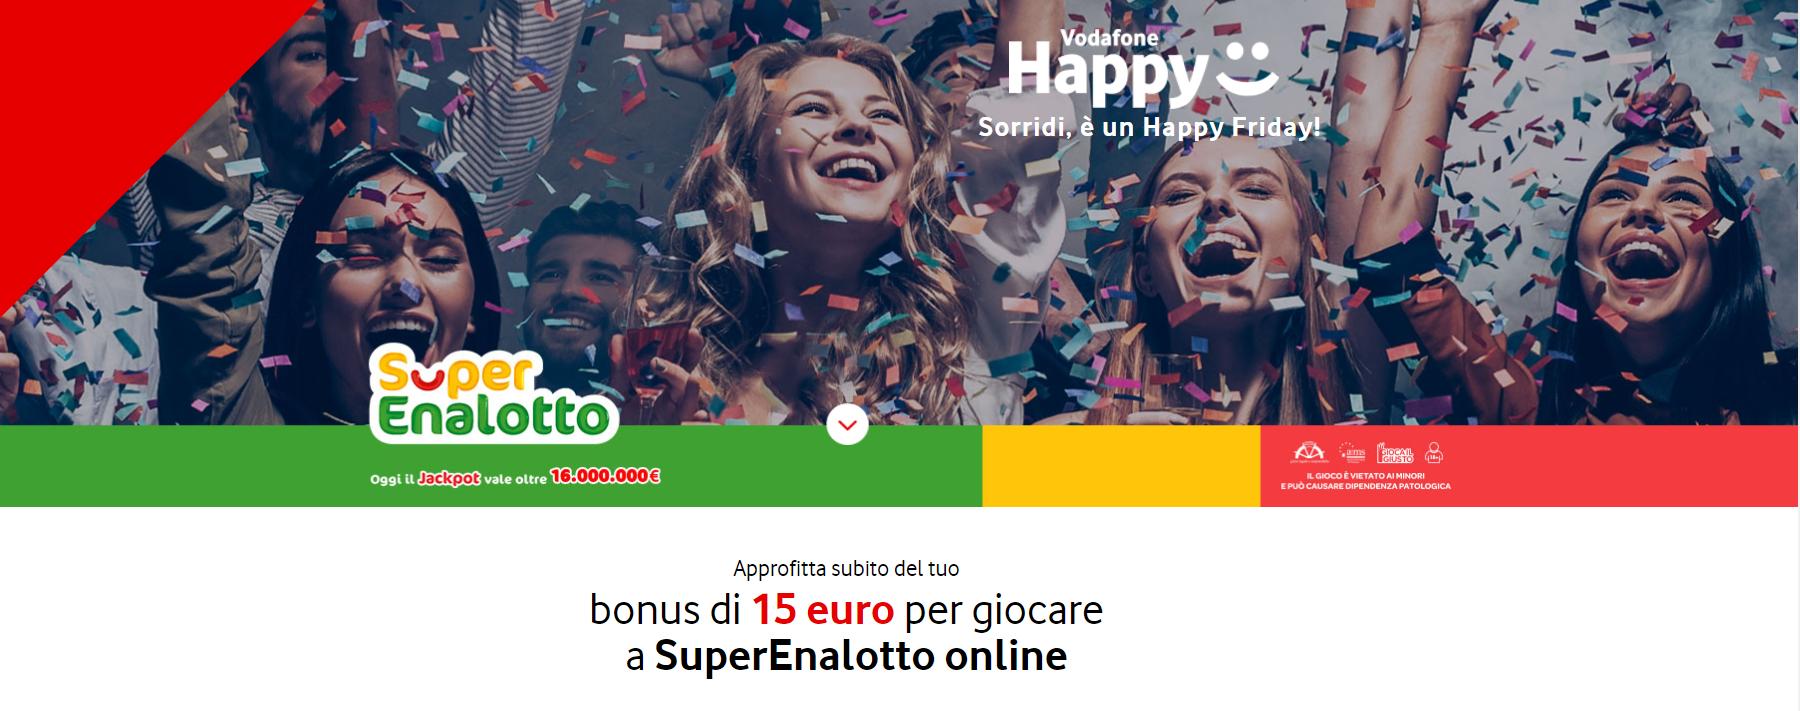 vodafone happy friday superenalotto banner